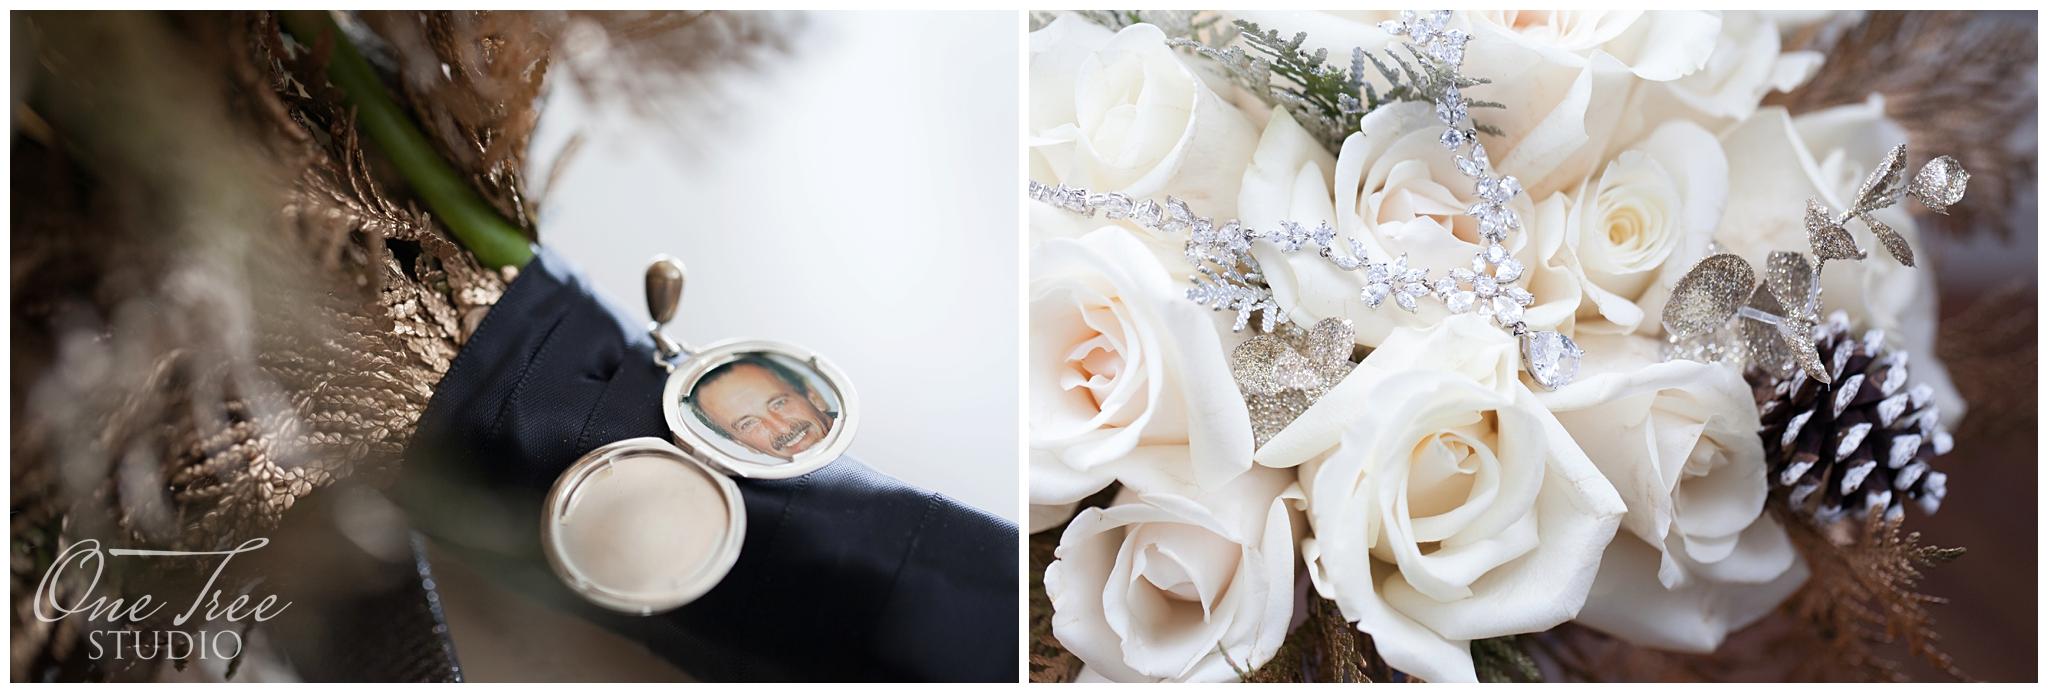 © One Tree Studio Inc. | Wedding Photographer | Toronto and Niagara